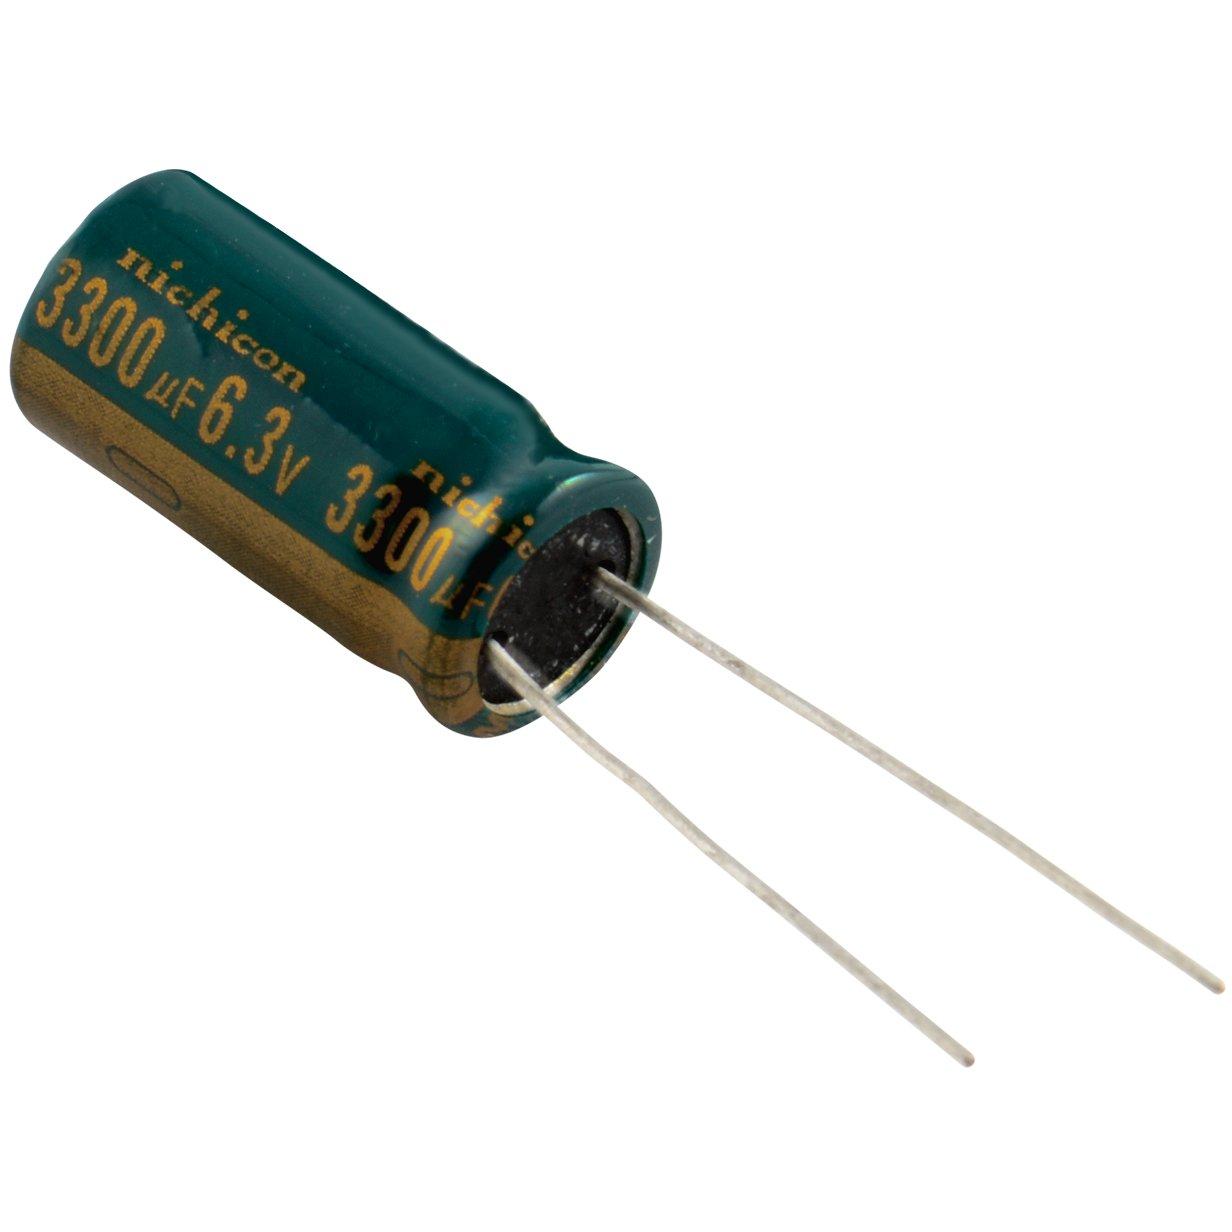 Nichicon 4700uF 6.3V 105C Radial Electrolytic Capacitor 9mm x 25mm